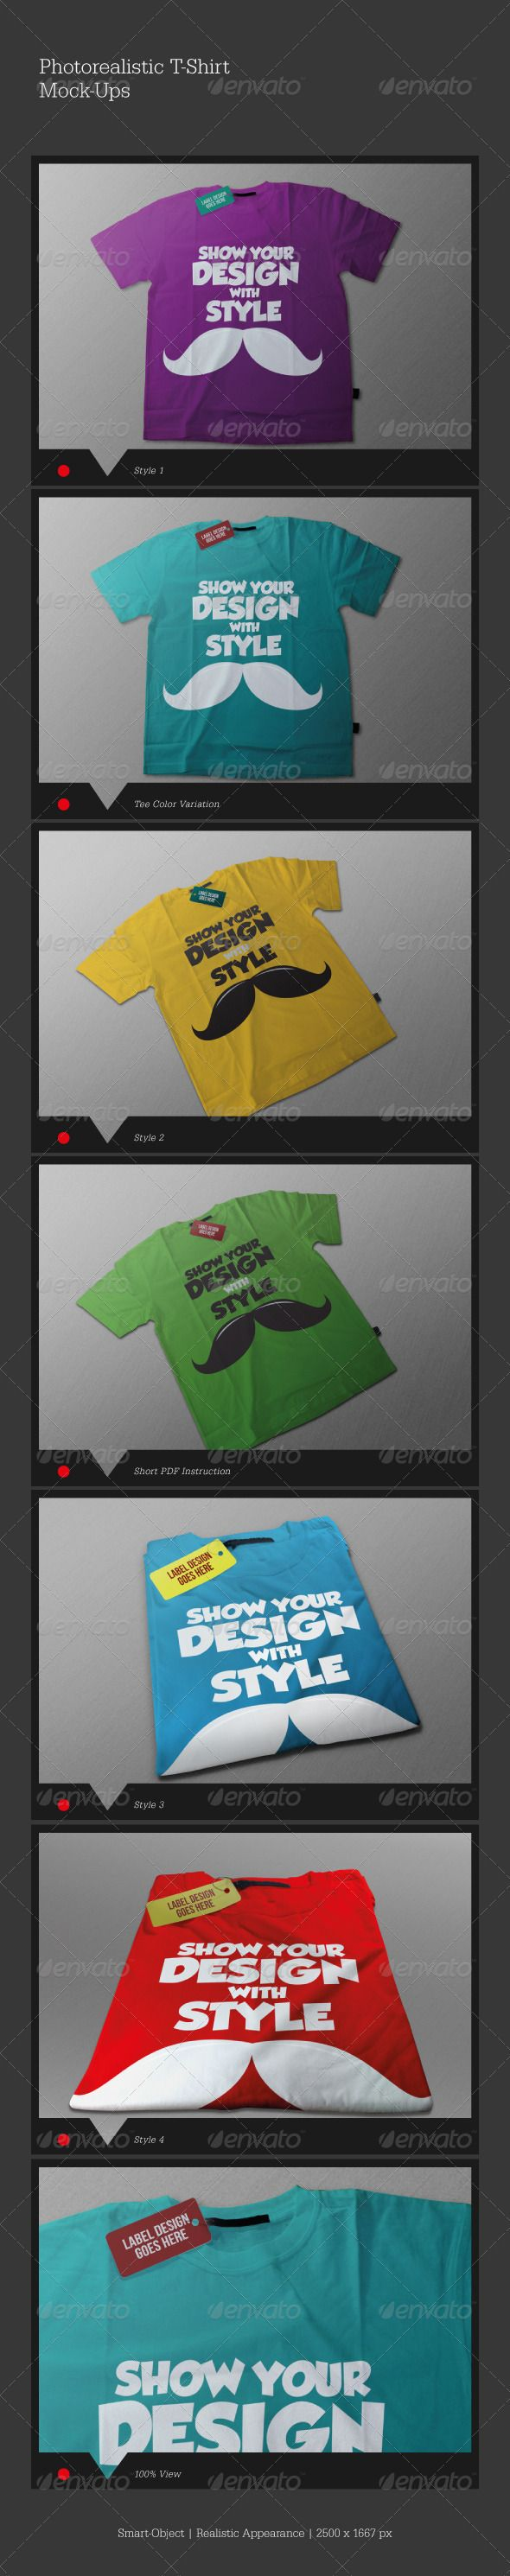 Scalable t shirt mockups more info - Photorealistic T Shirt Mock Ups